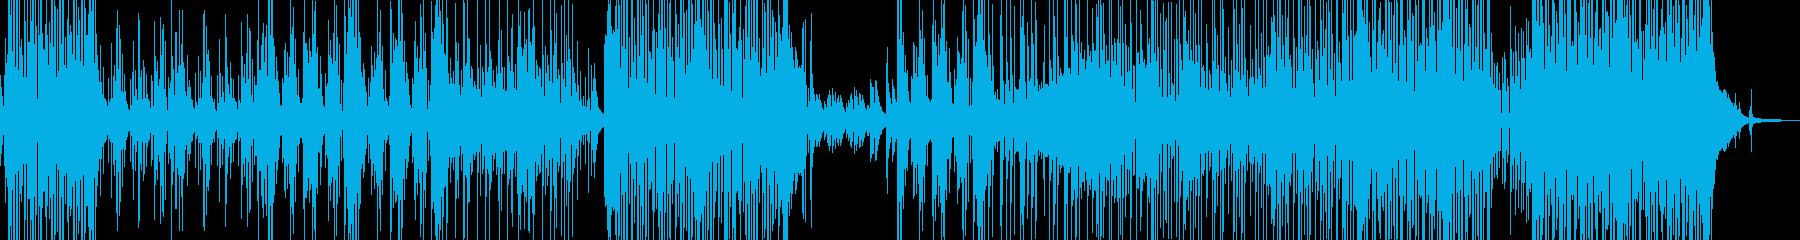 SNS女子・キャピキャピなR&B 短尺の再生済みの波形